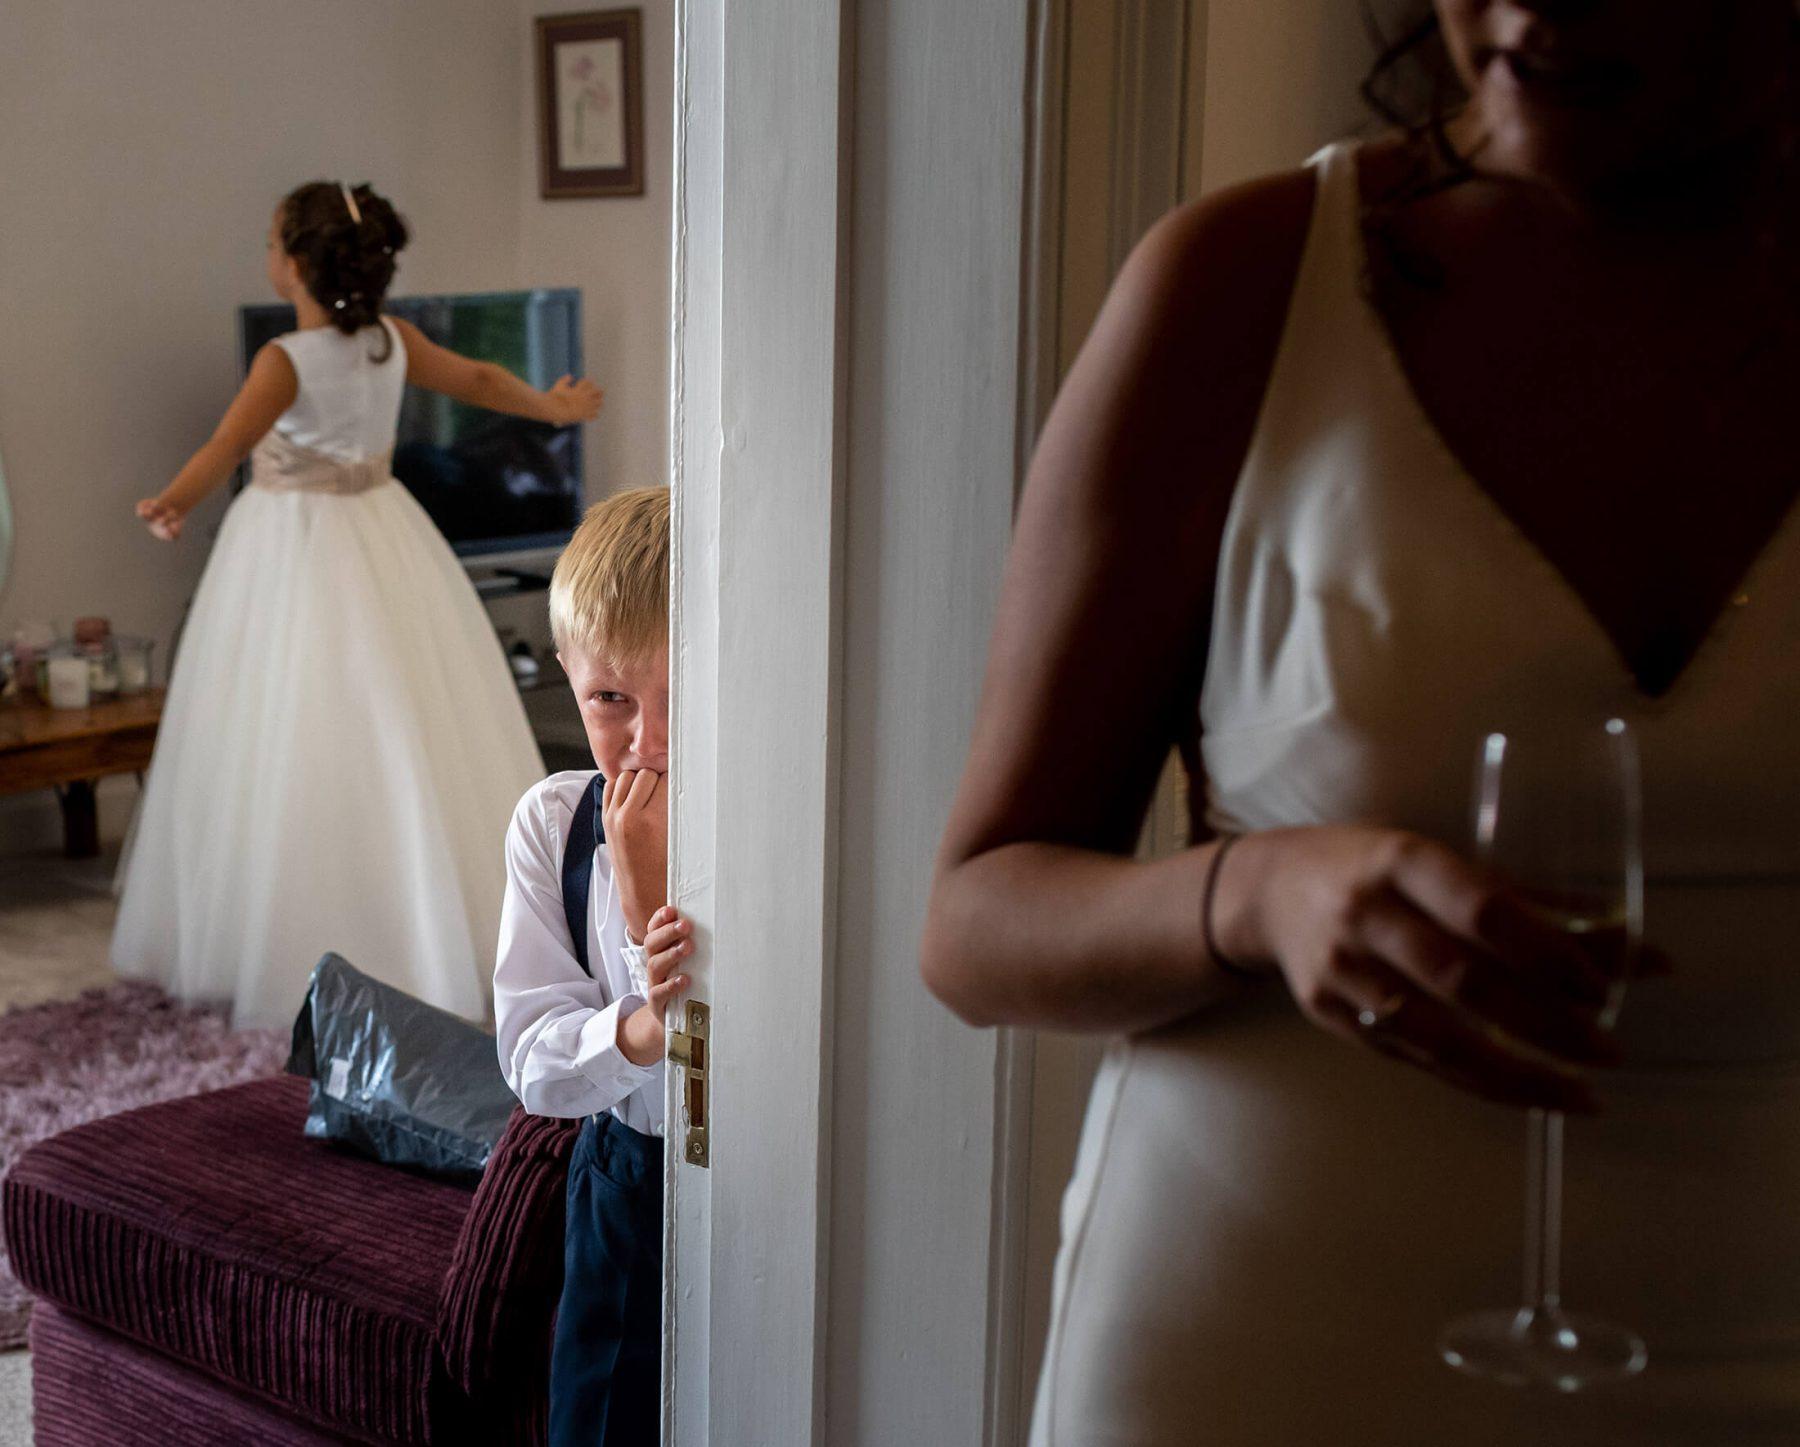 A young boy cries during bridal prep.